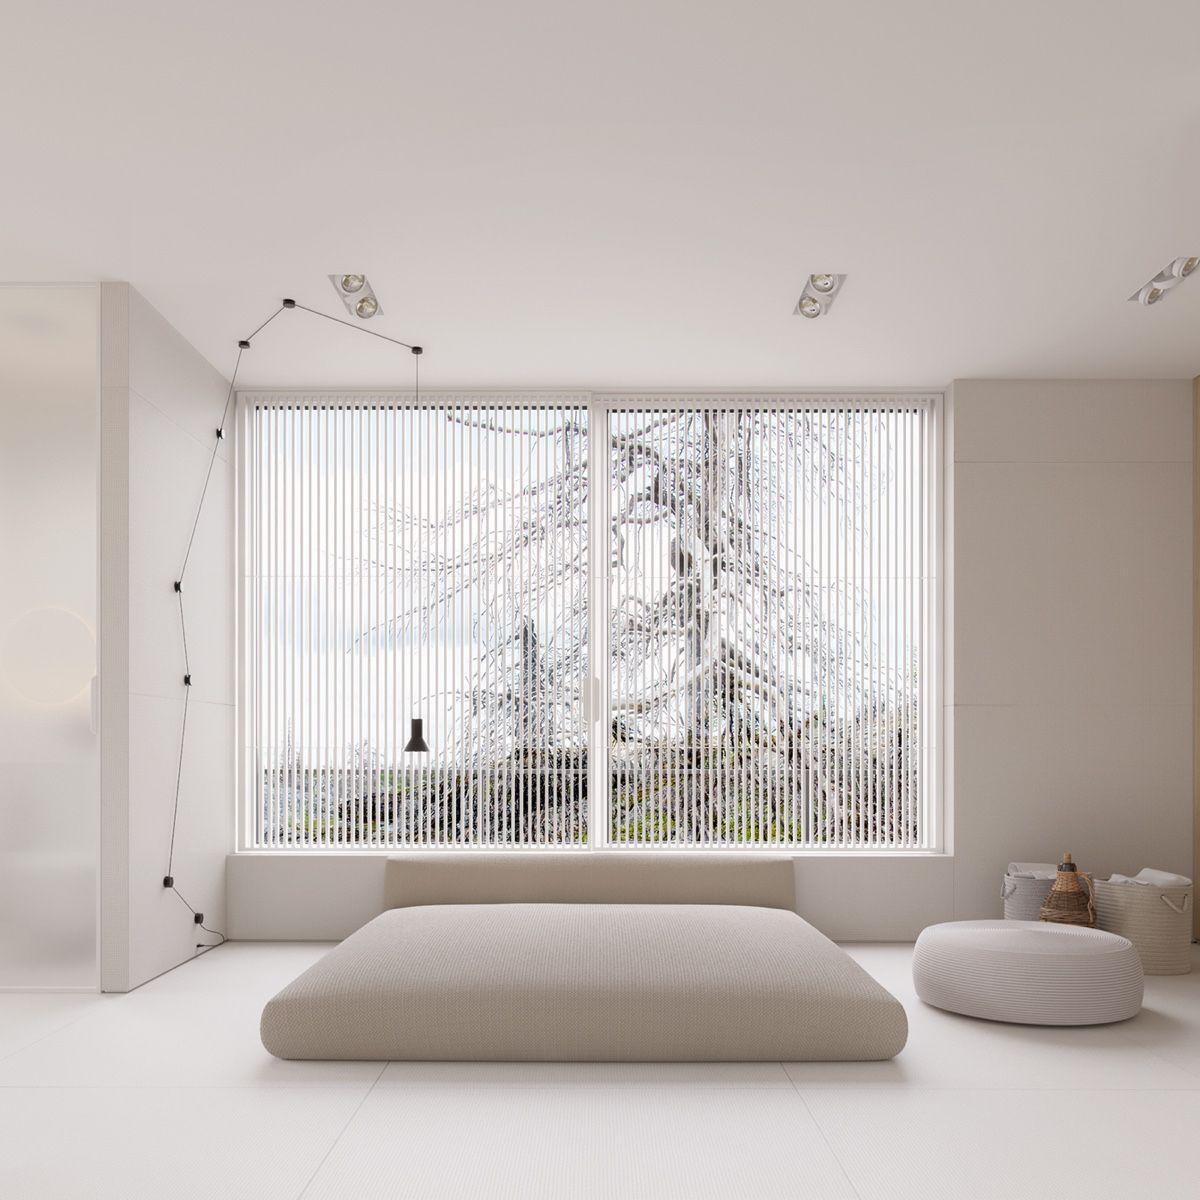 big-windows-simple-double-bed-white-carpet